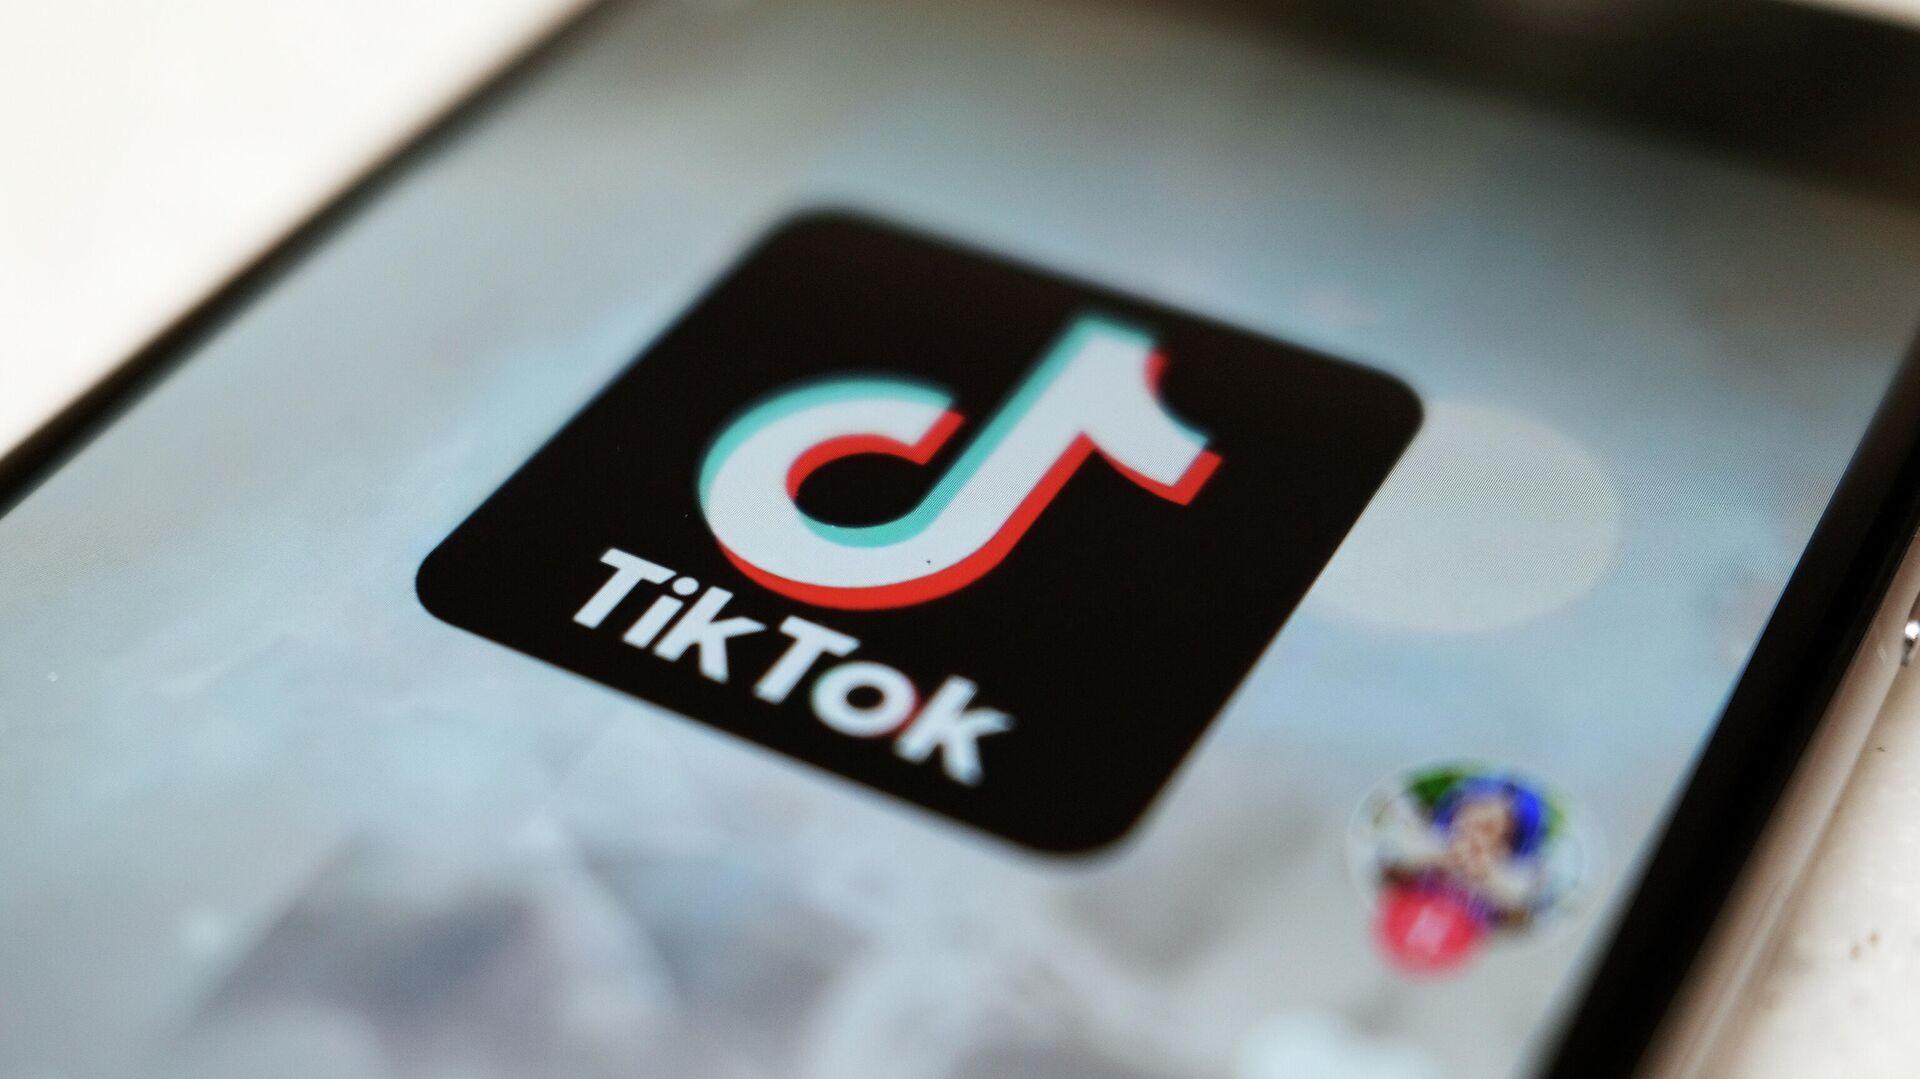 Логотип приложения TikTok на экране смартфона - РИА Новости, 1920, 16.09.2021